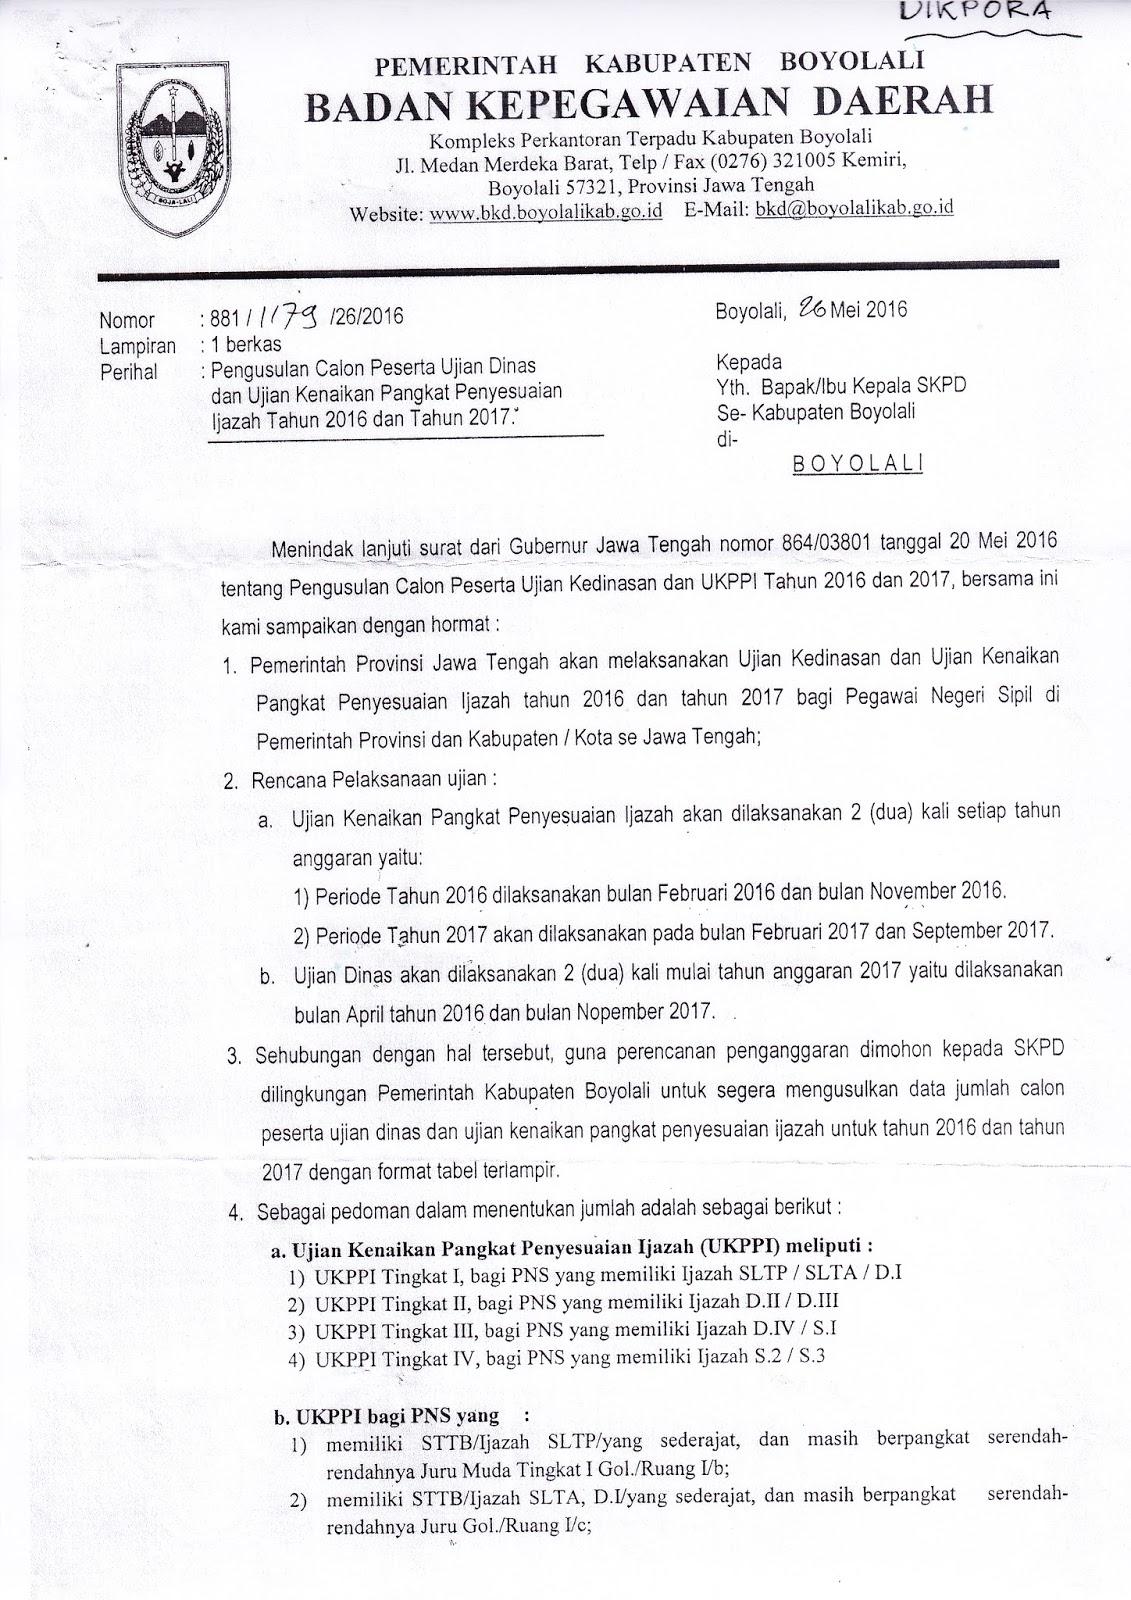 Info Sma Smk Kabupaten Boyolali Pengusulan Calon Peserta Ujian Dinas Dan Ujian Kenaikan Pangkai